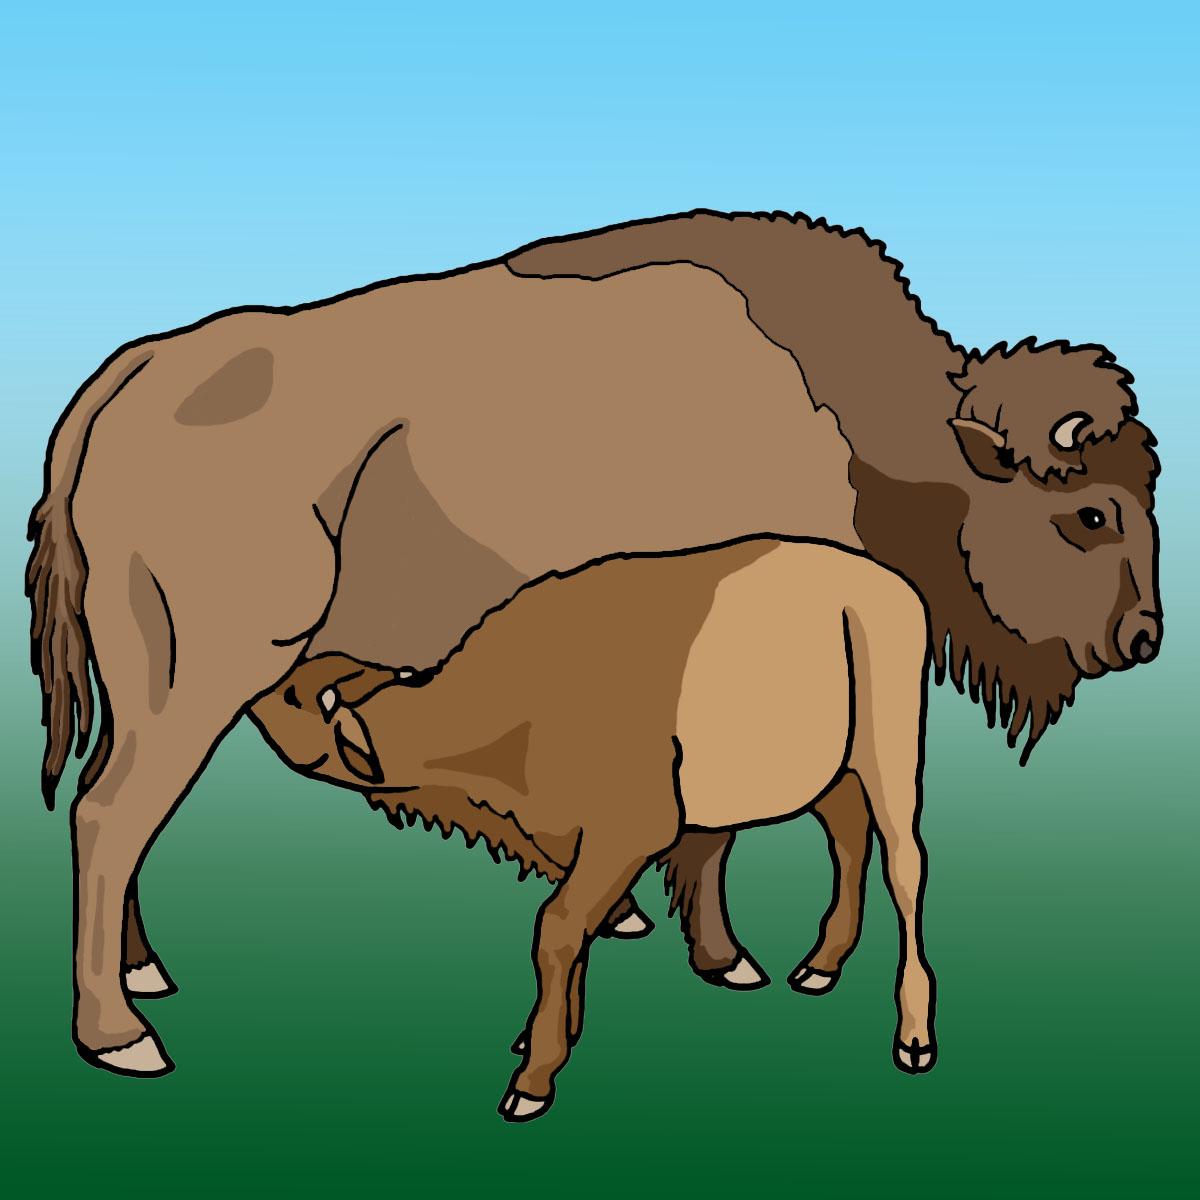 Clip art buffalo calf grayscale image #22837.